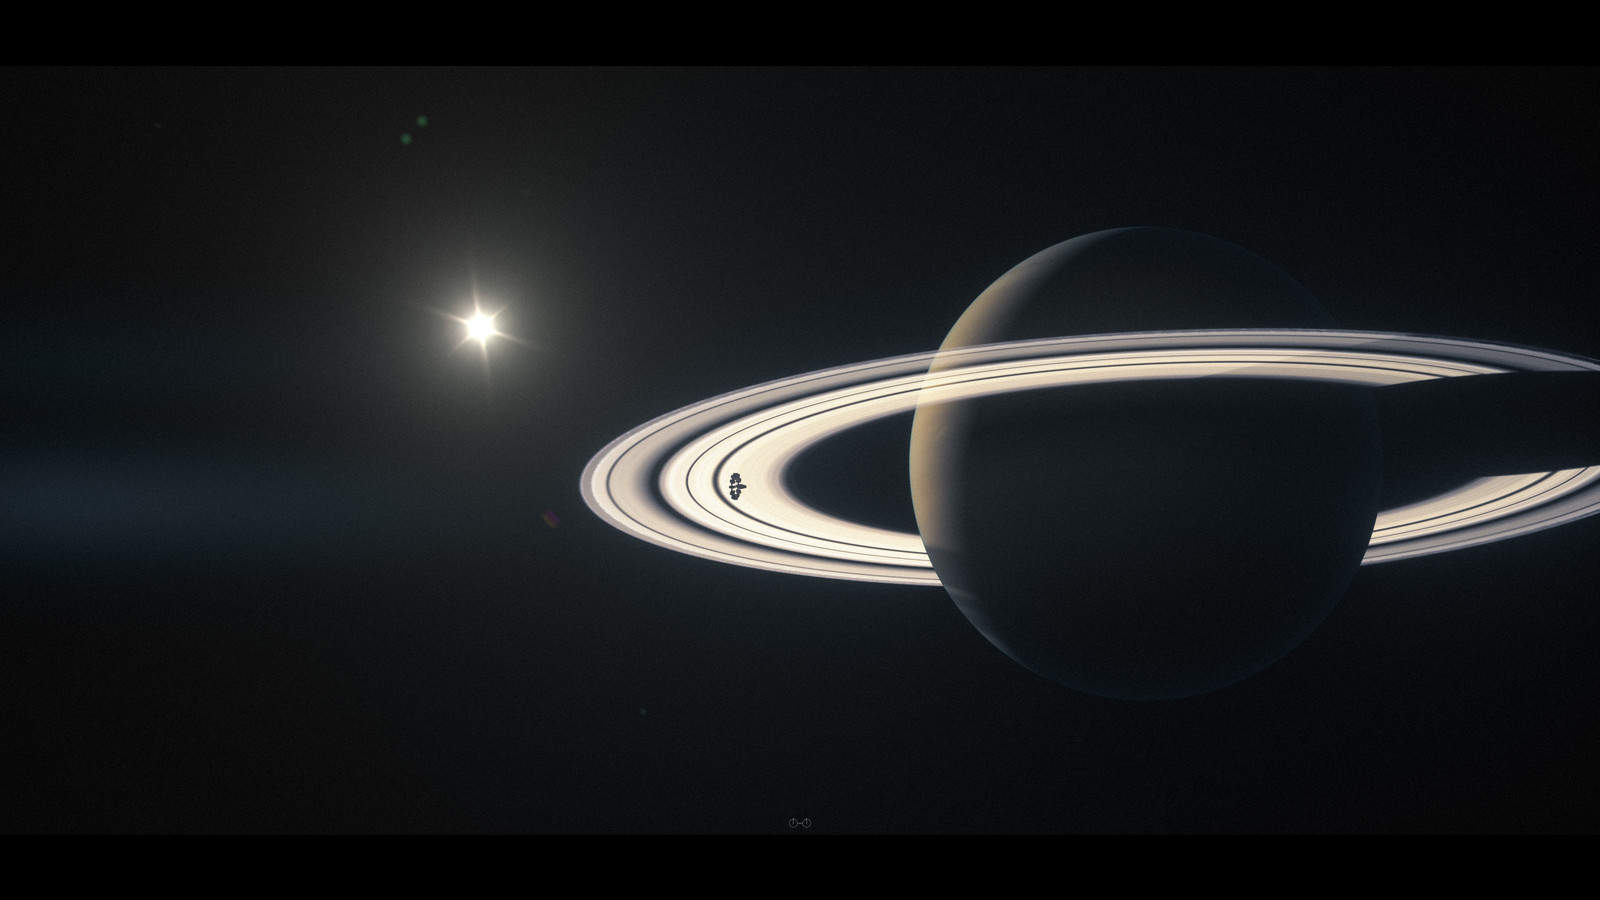 The Endurance orbiting Saturn